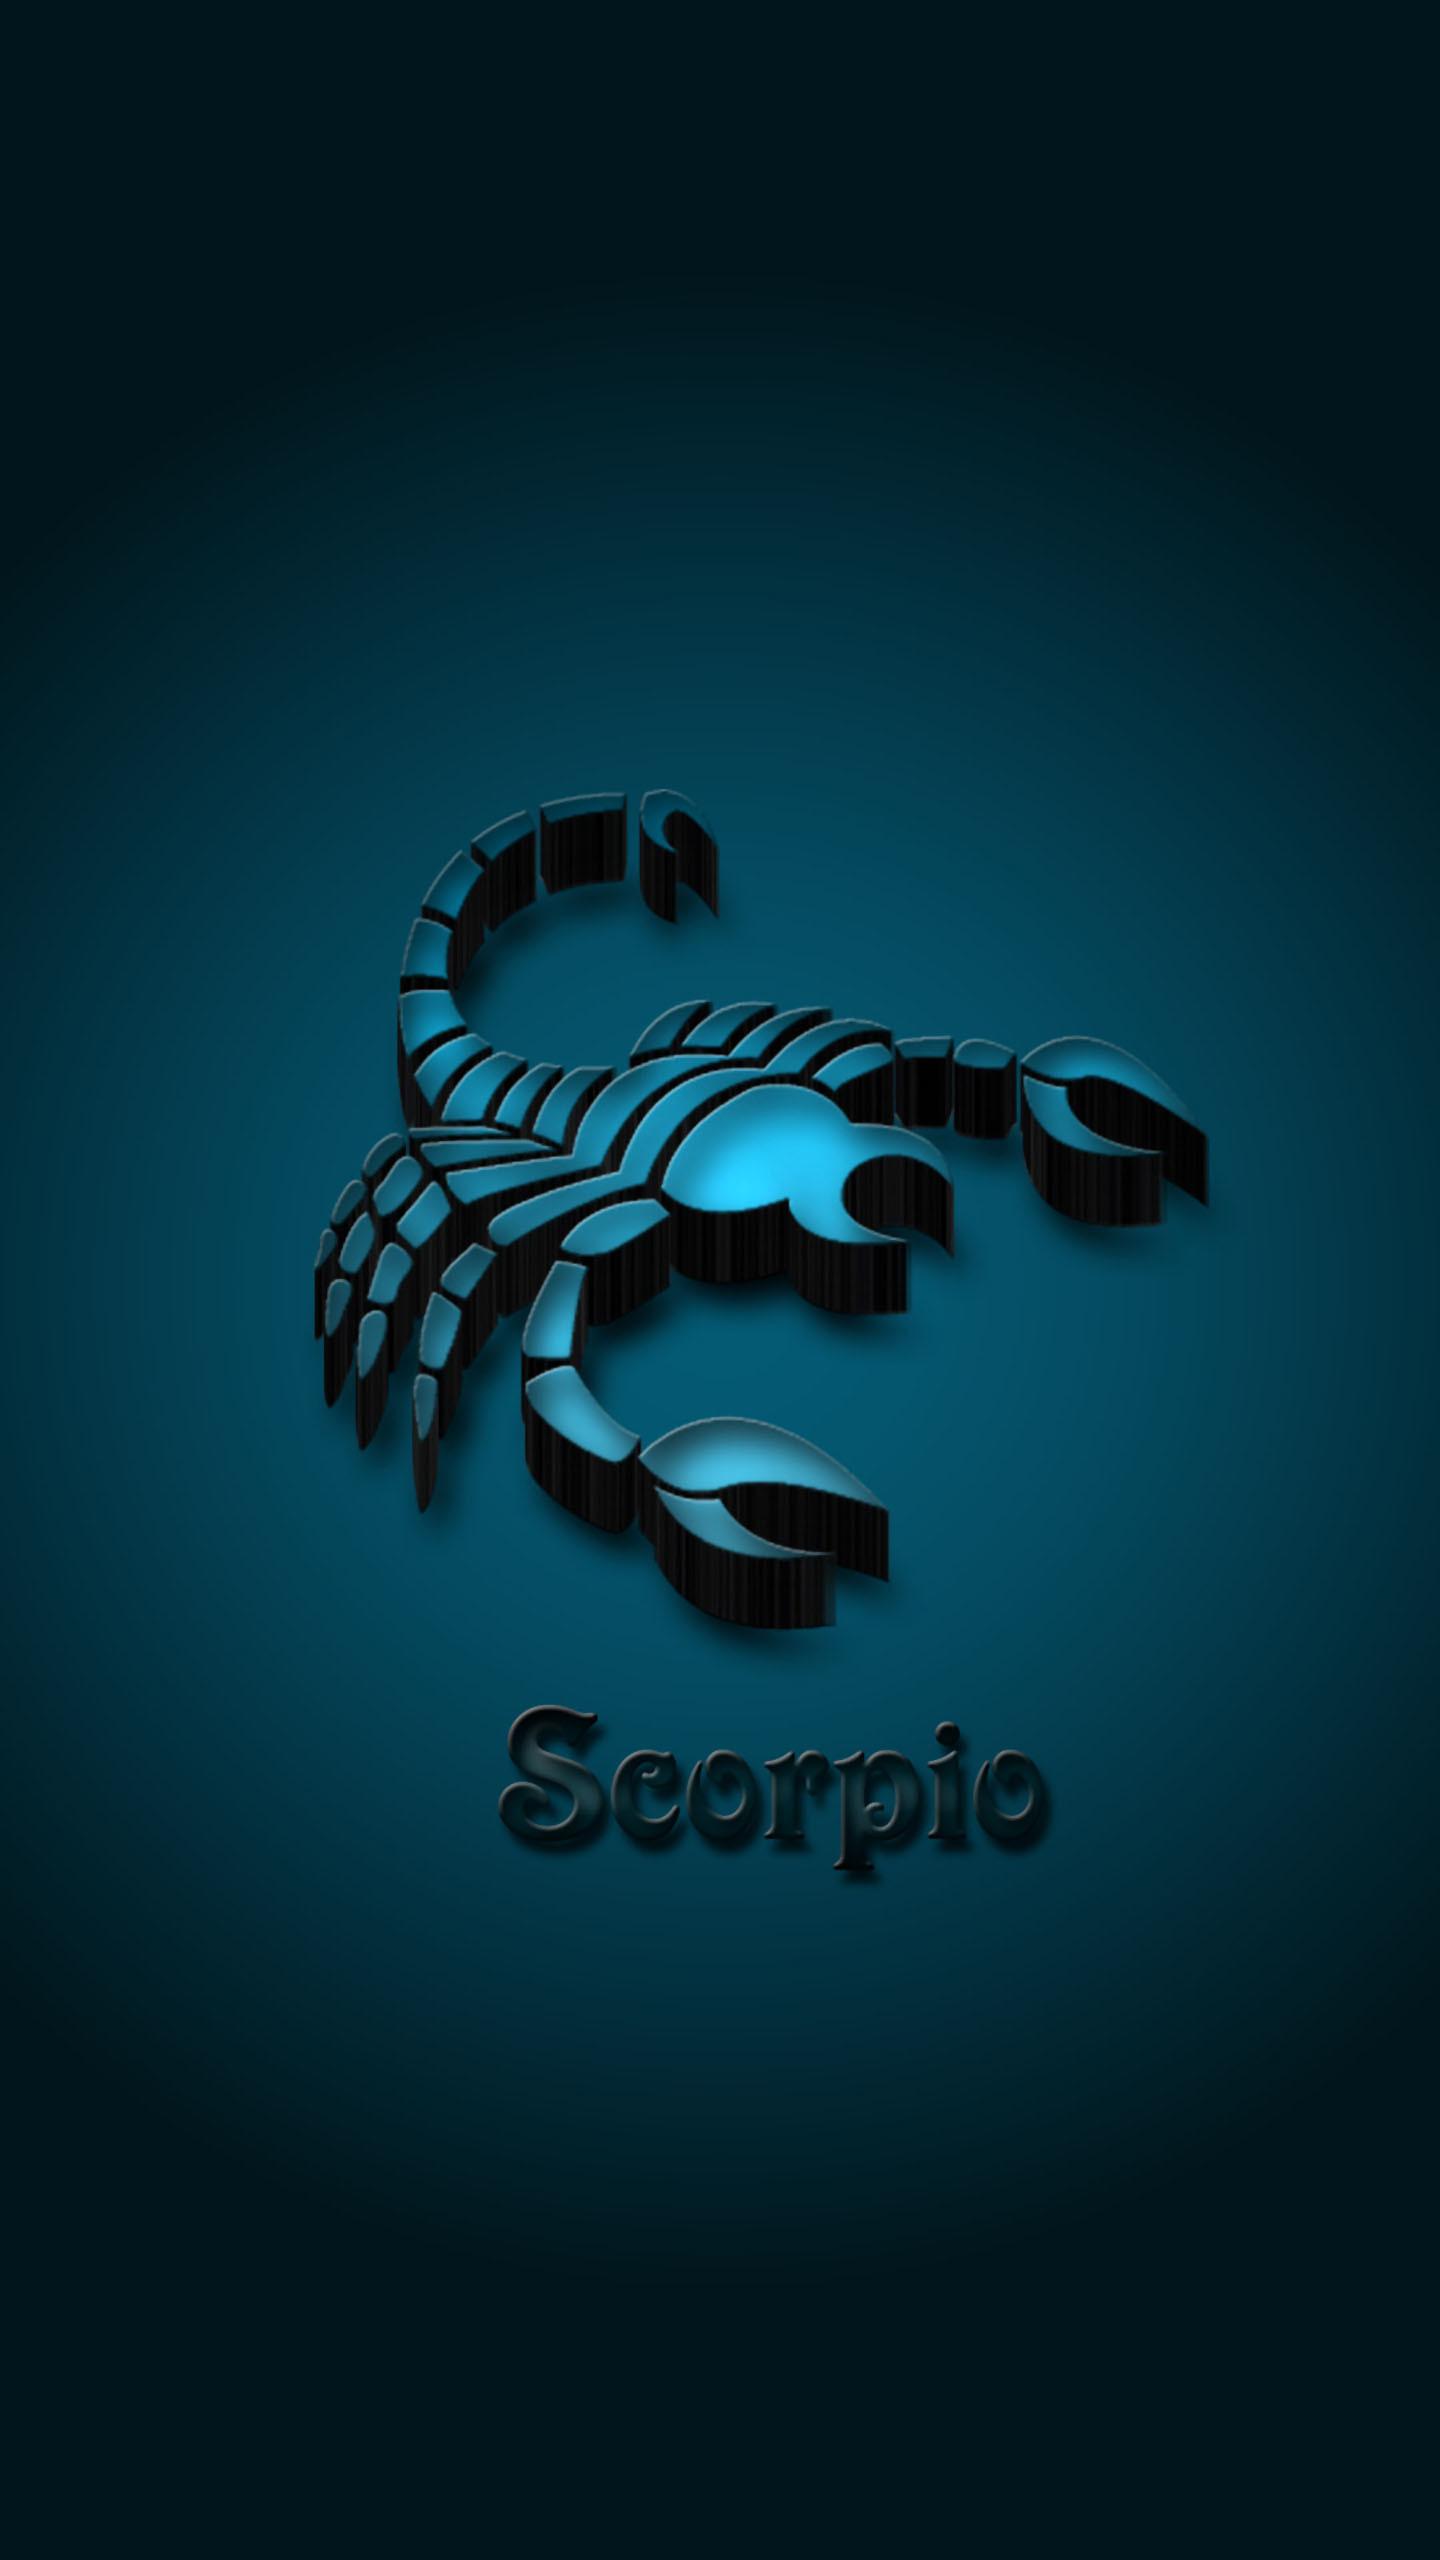 1920x1080 Scorpio Tattoo Design Art Images Black Wallpap 7882 Wallpaper